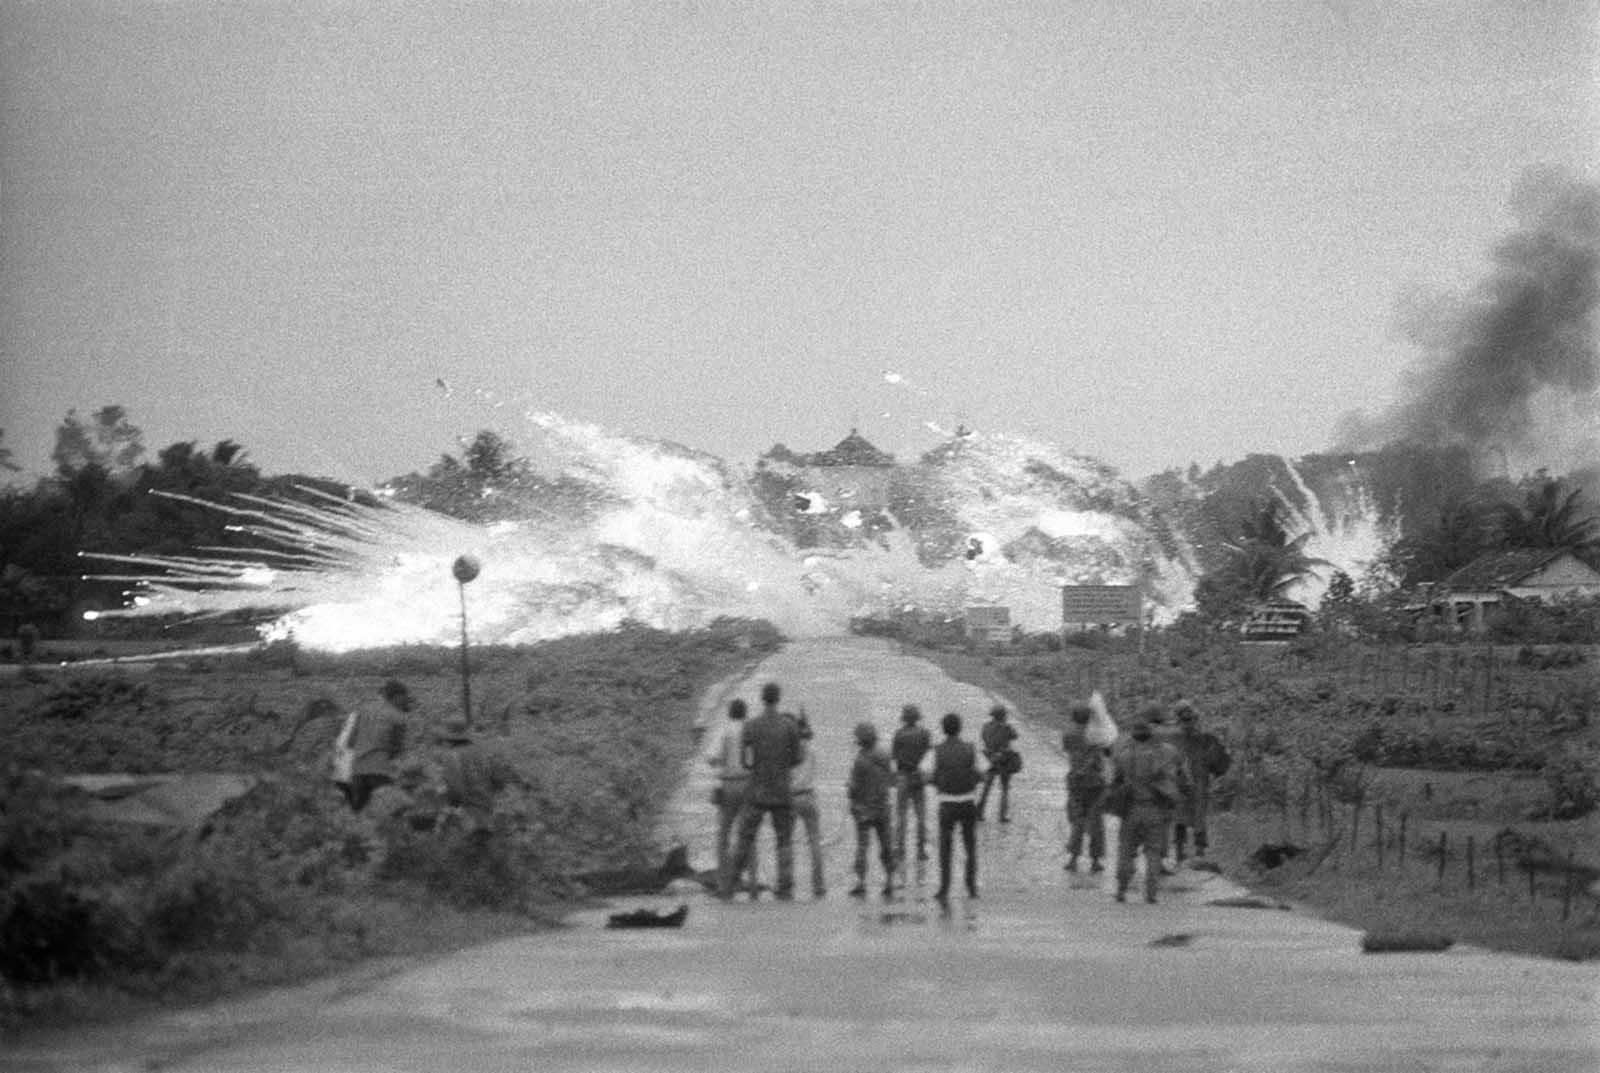 Vietnam War: Escalation and Withdrawal, 1968-1975